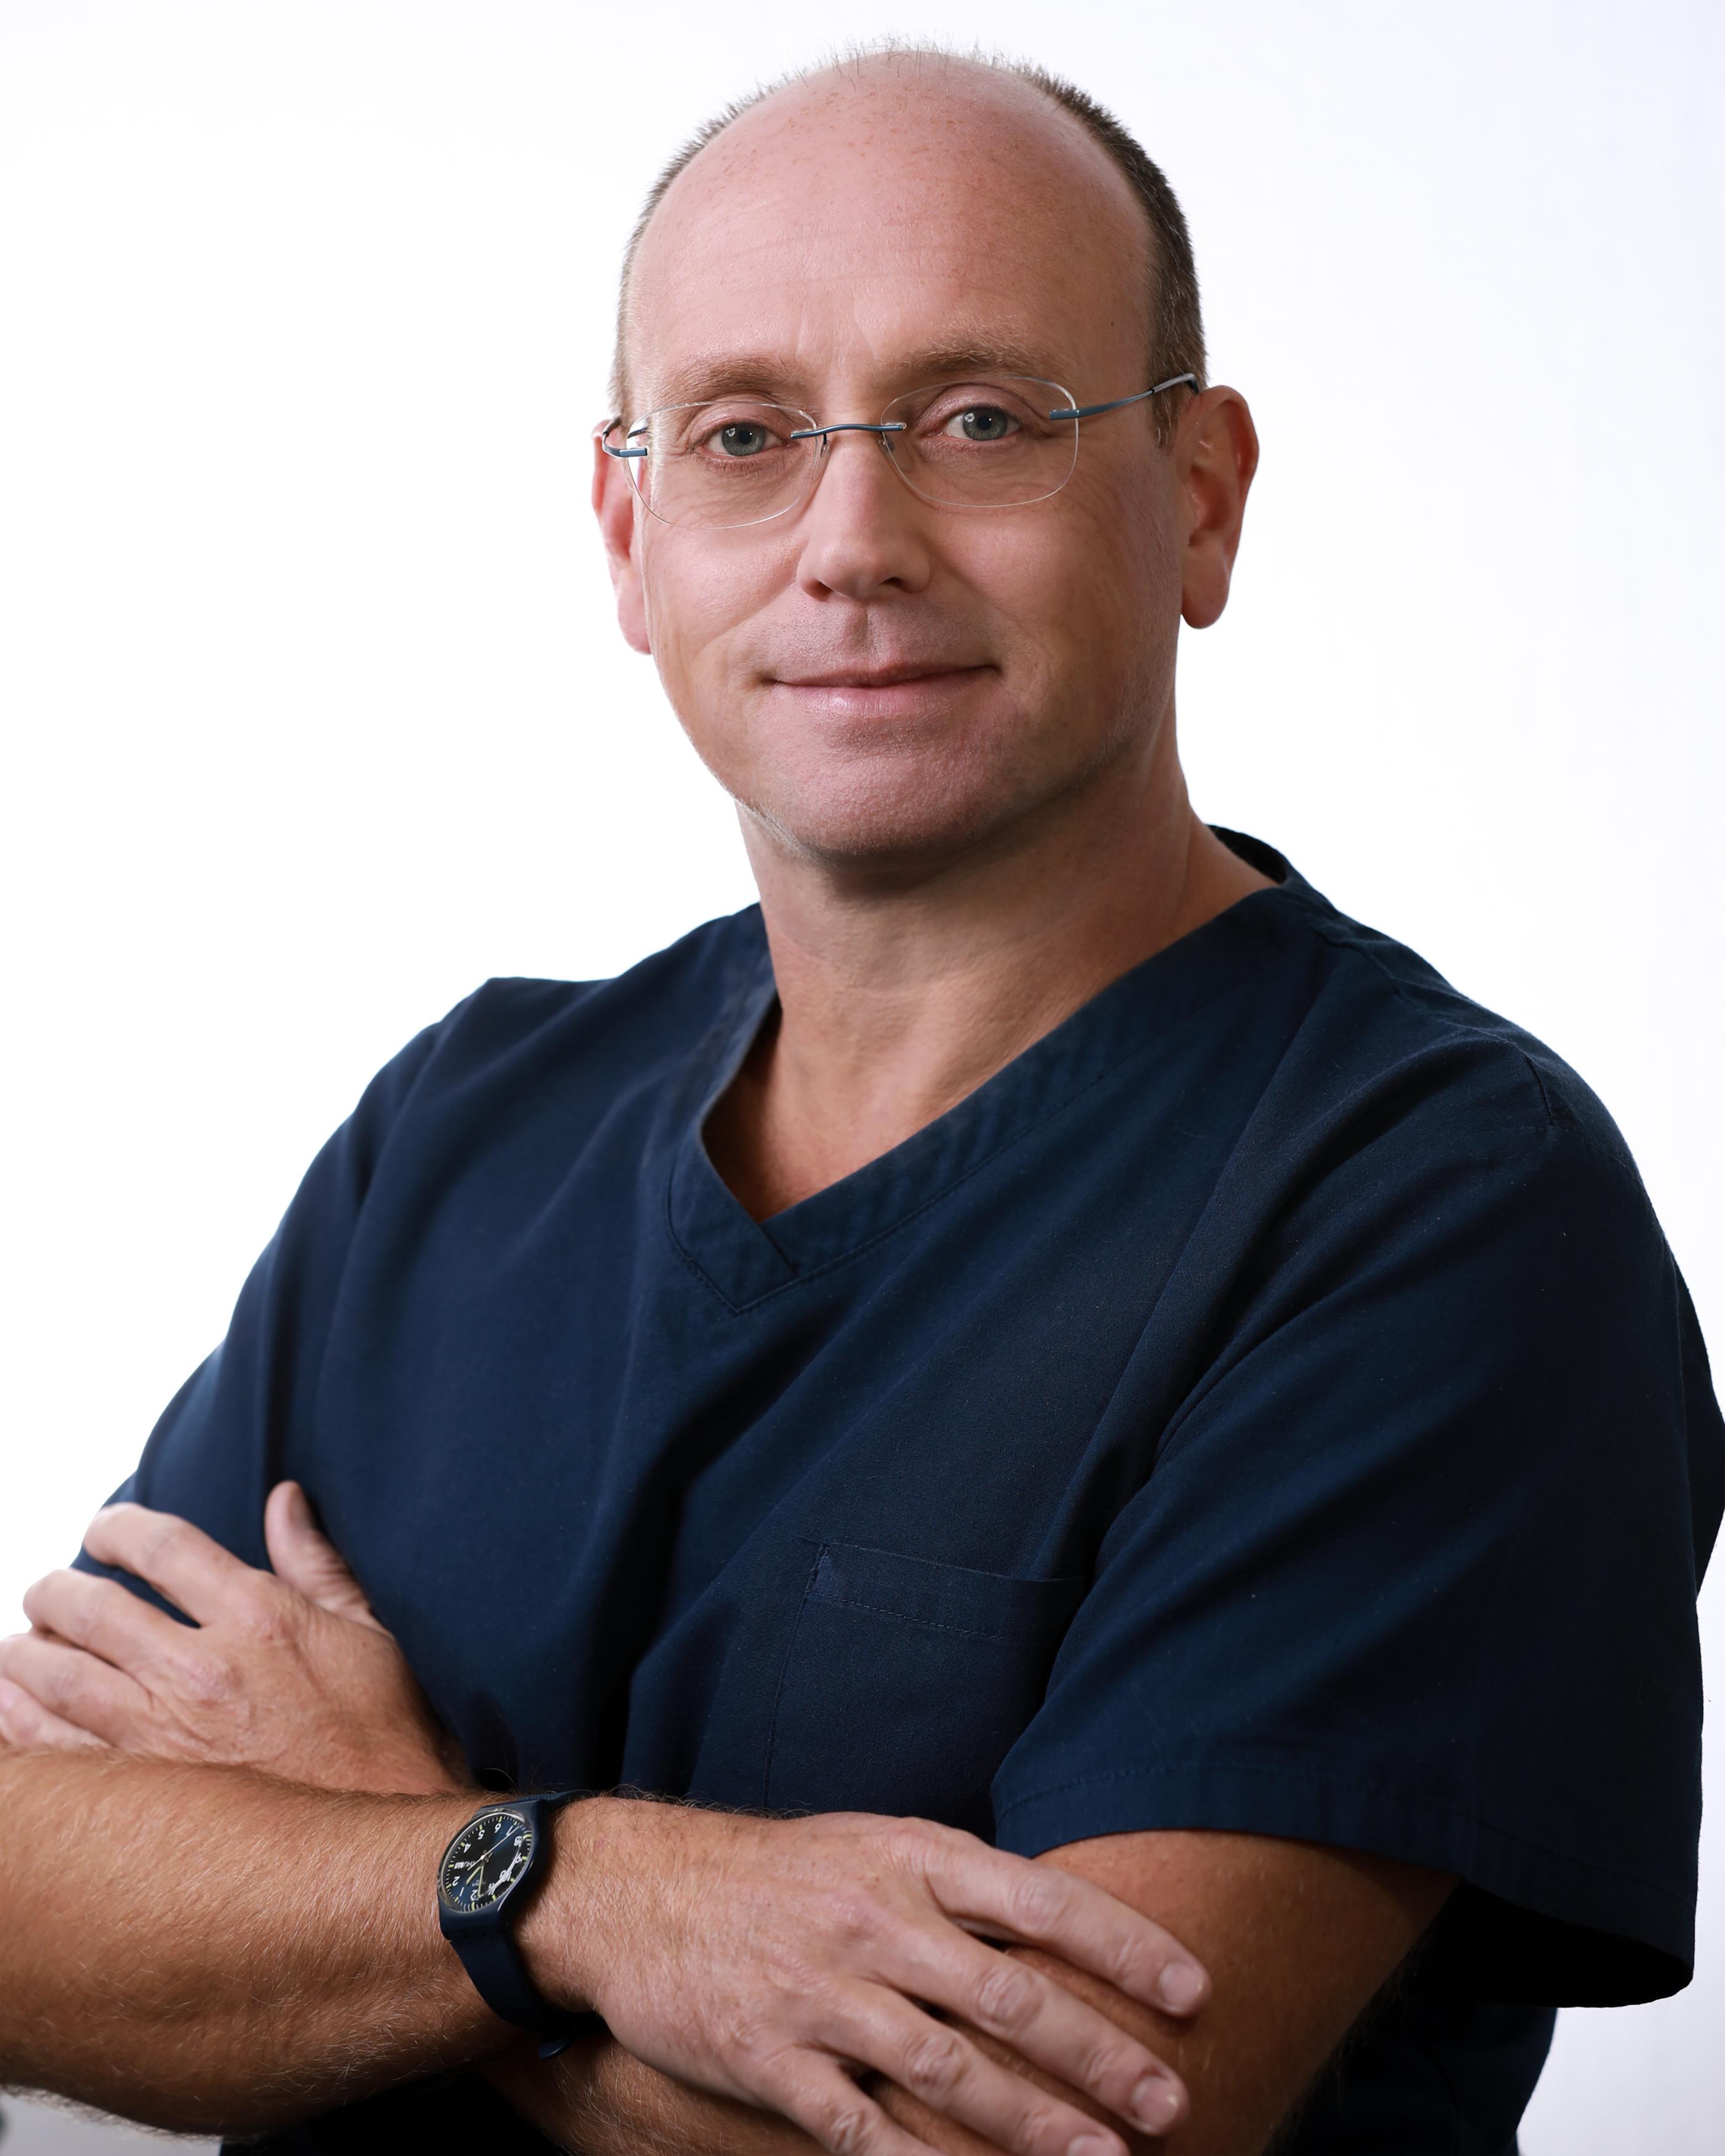 Dr. Jason J Critchlow